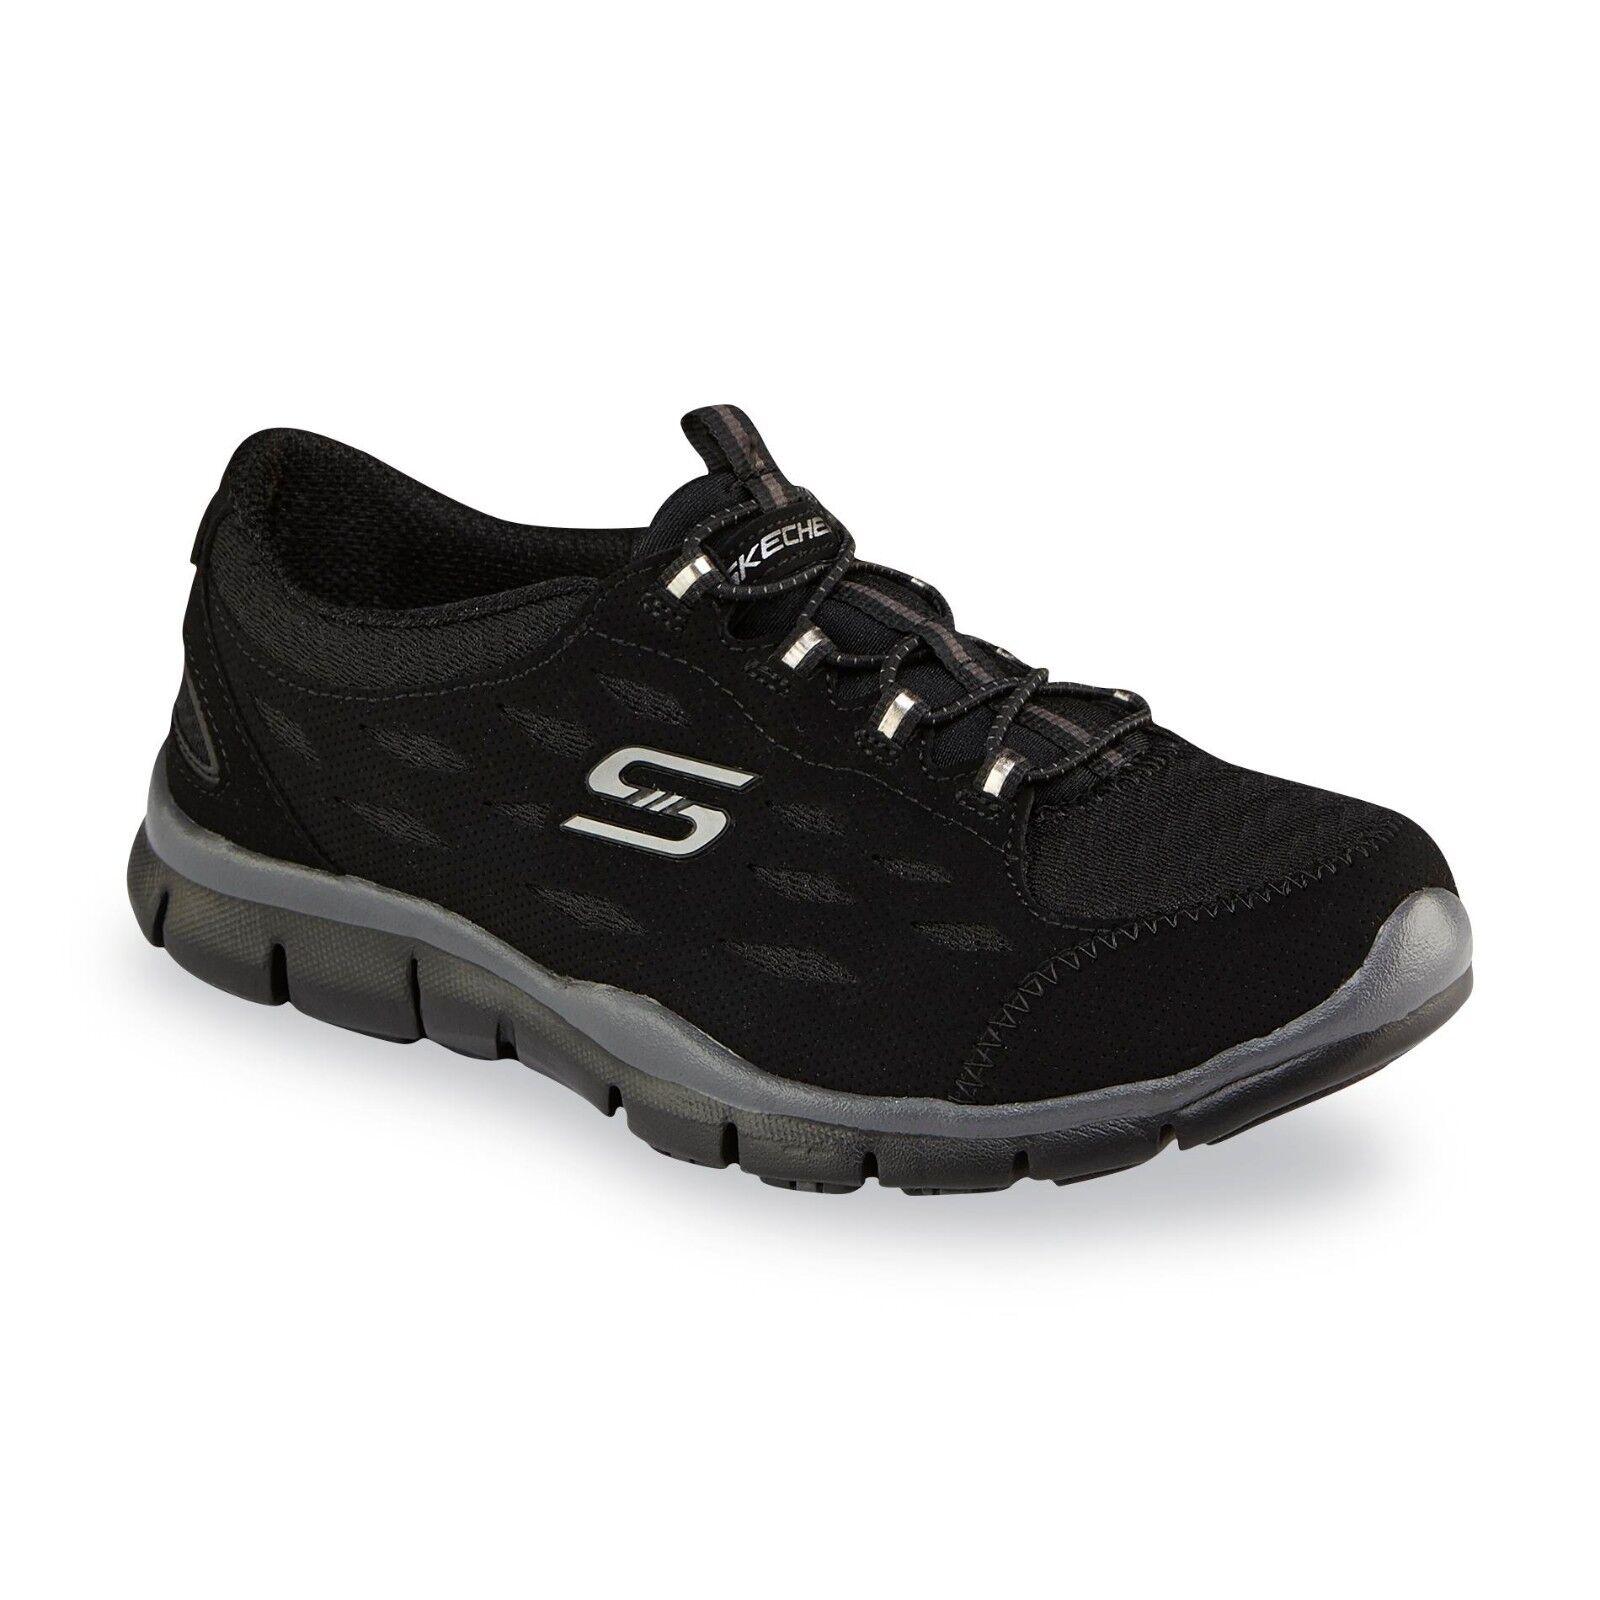 Mujer Skechers Gratis 22604 Negro Slip On Deportivo casual zapatos para caminar